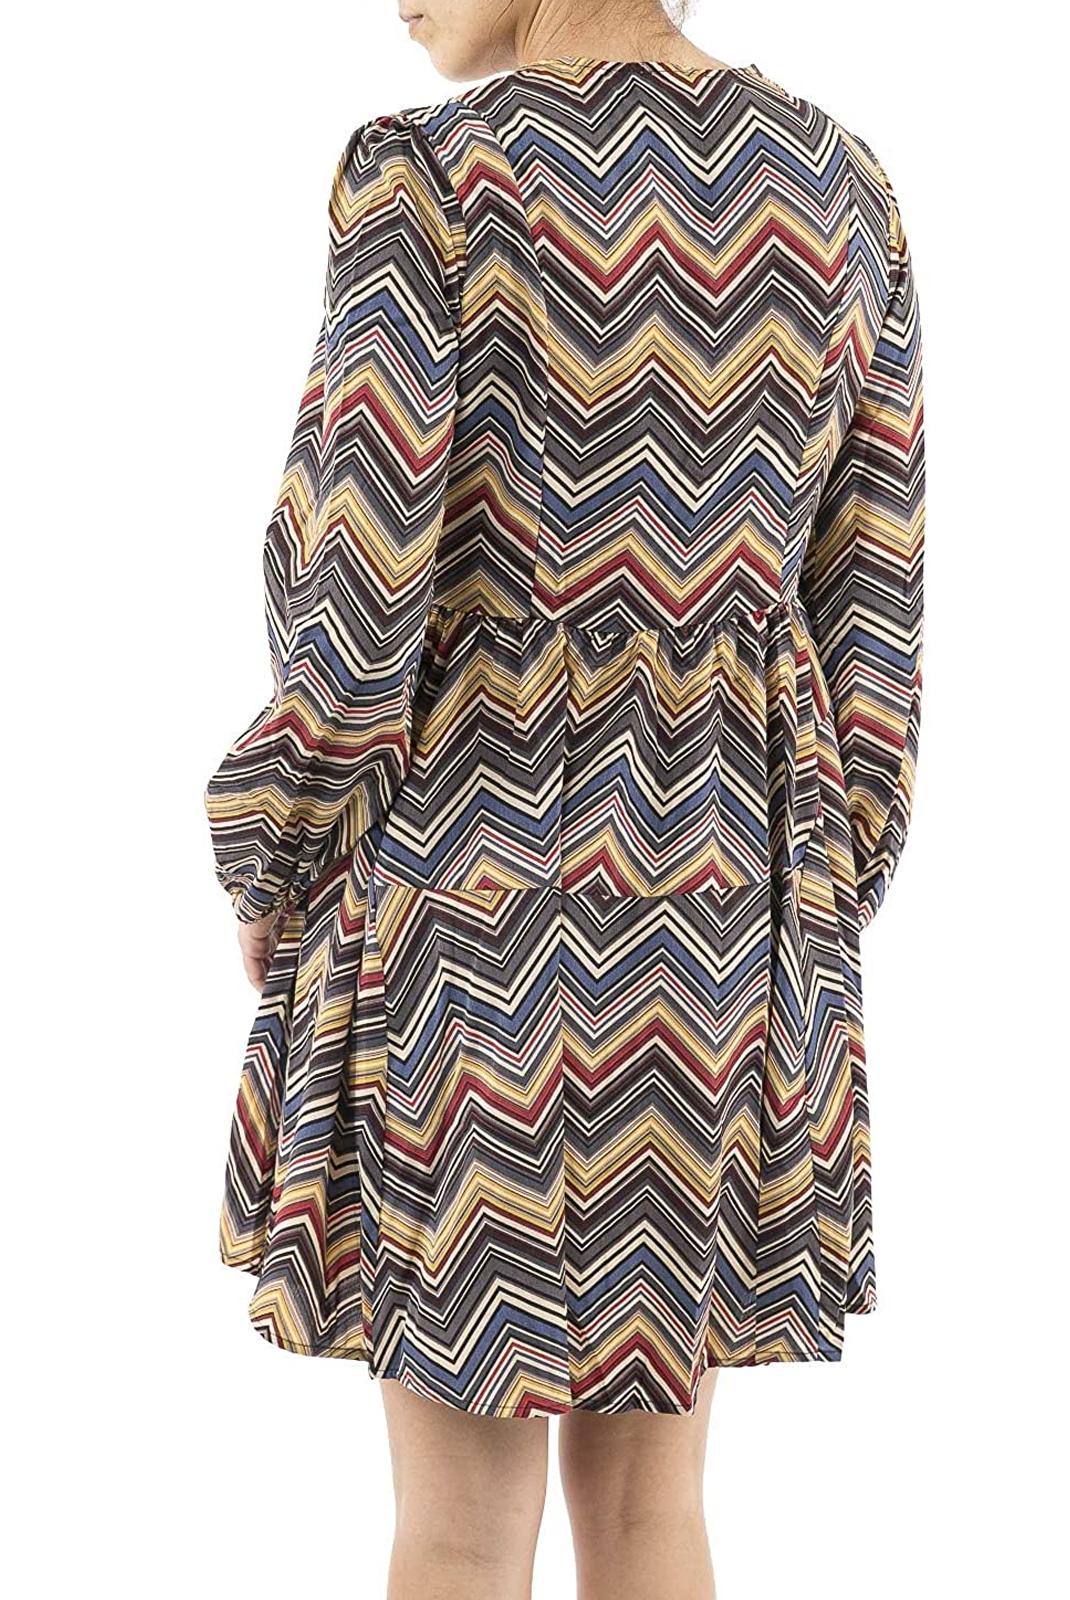 Robes  Molly bracken MBN67A19 MULTICO